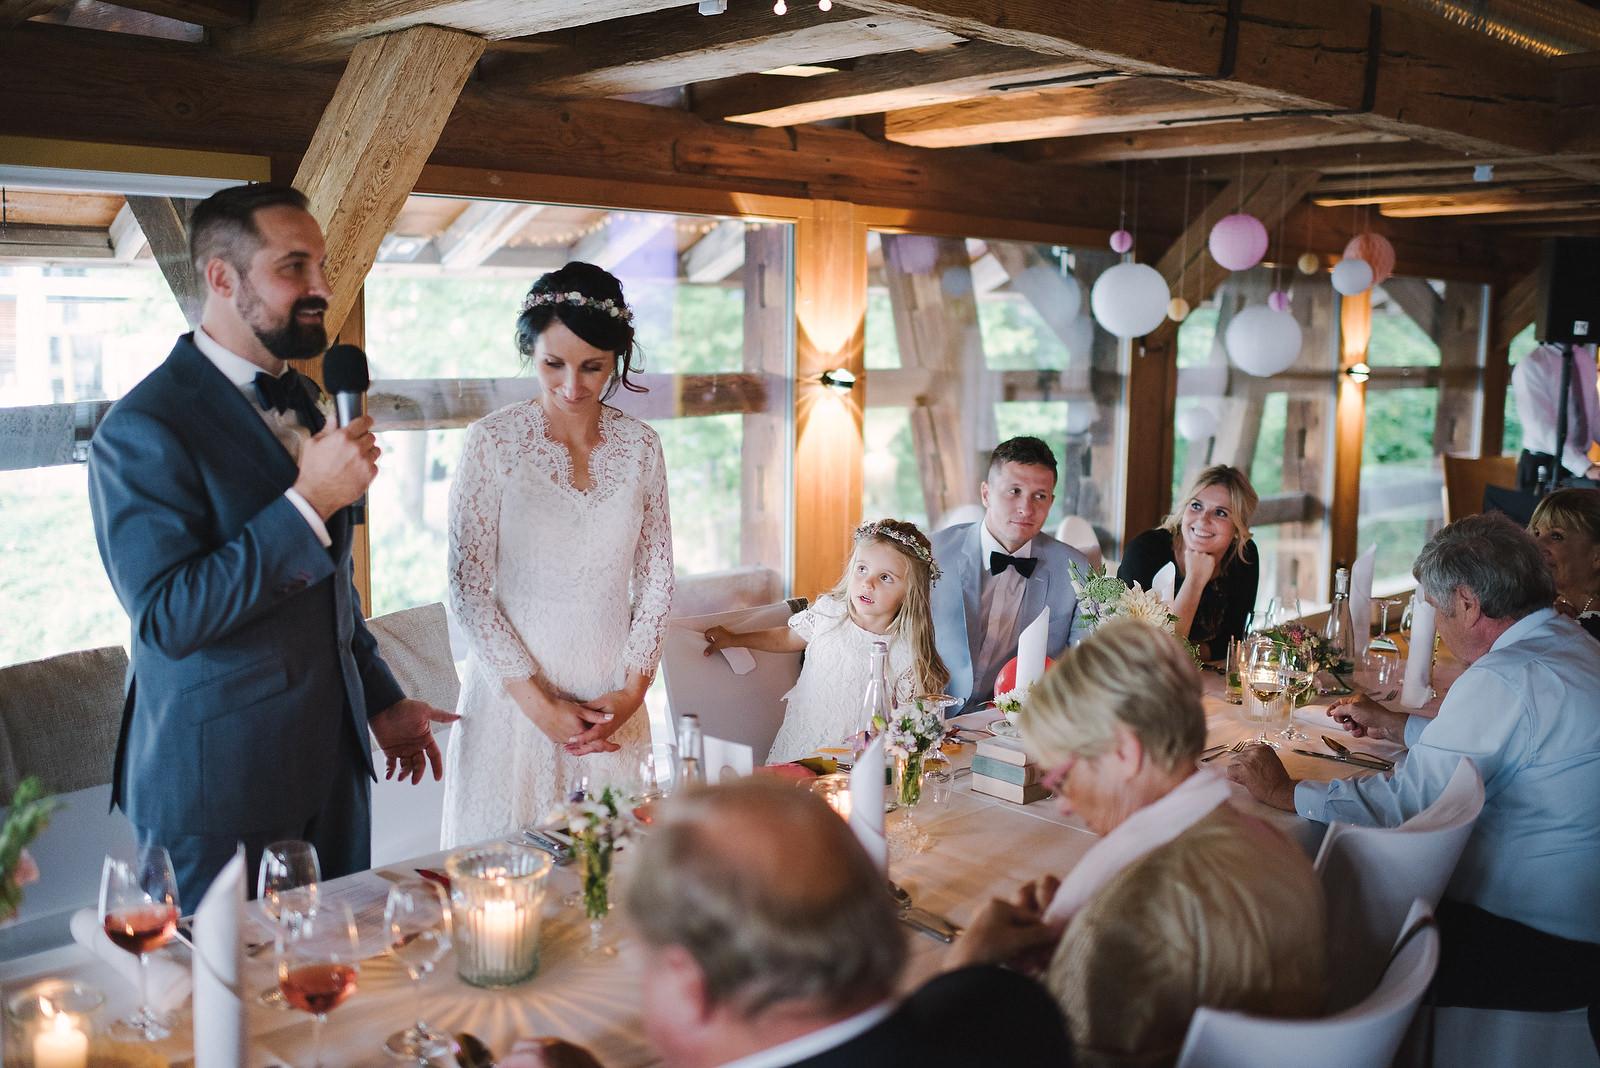 Fotograf Konstanz - Hochzeitsfotograf Reutlingen Achalm Hochzeit EFP 79 - Als Hochzeitsfotograf auf der Achalm, Reutlingen  - 65 -